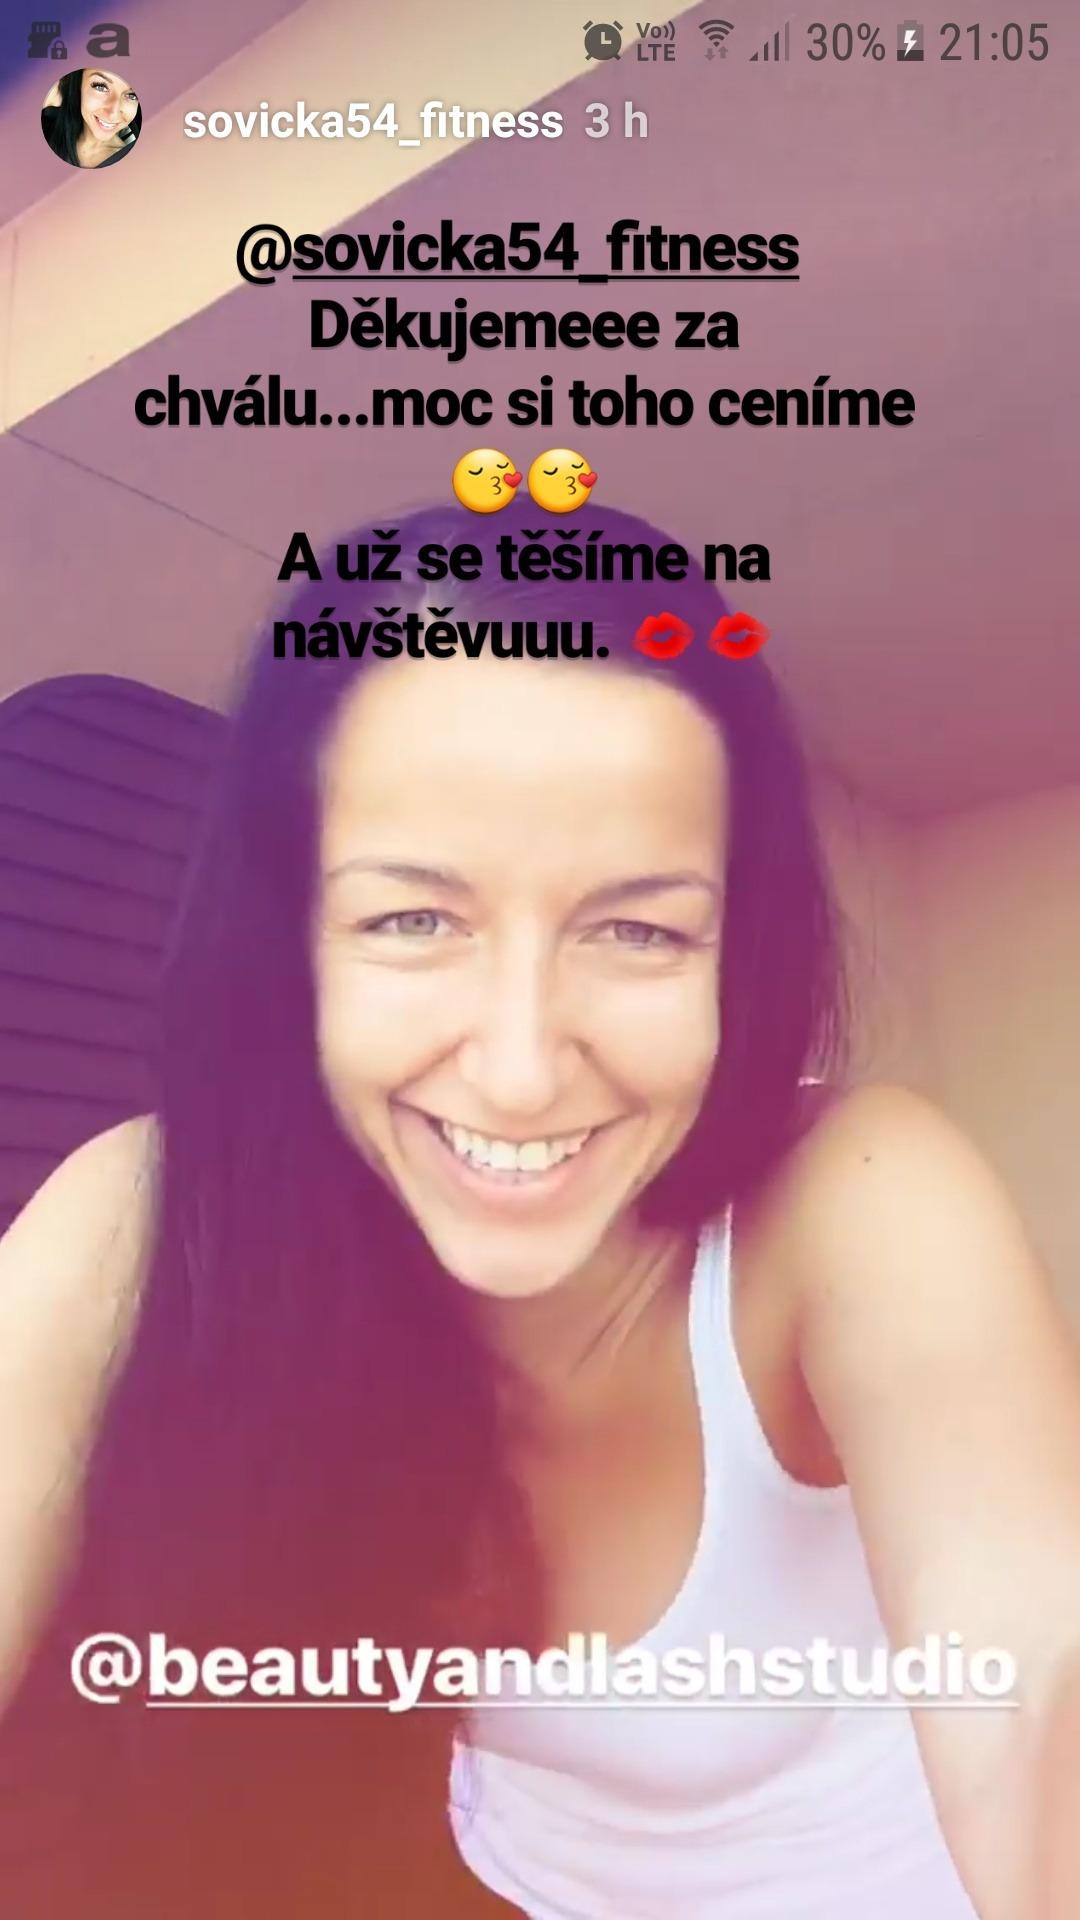 Hana Wolfová (@sovicka54_fitness)